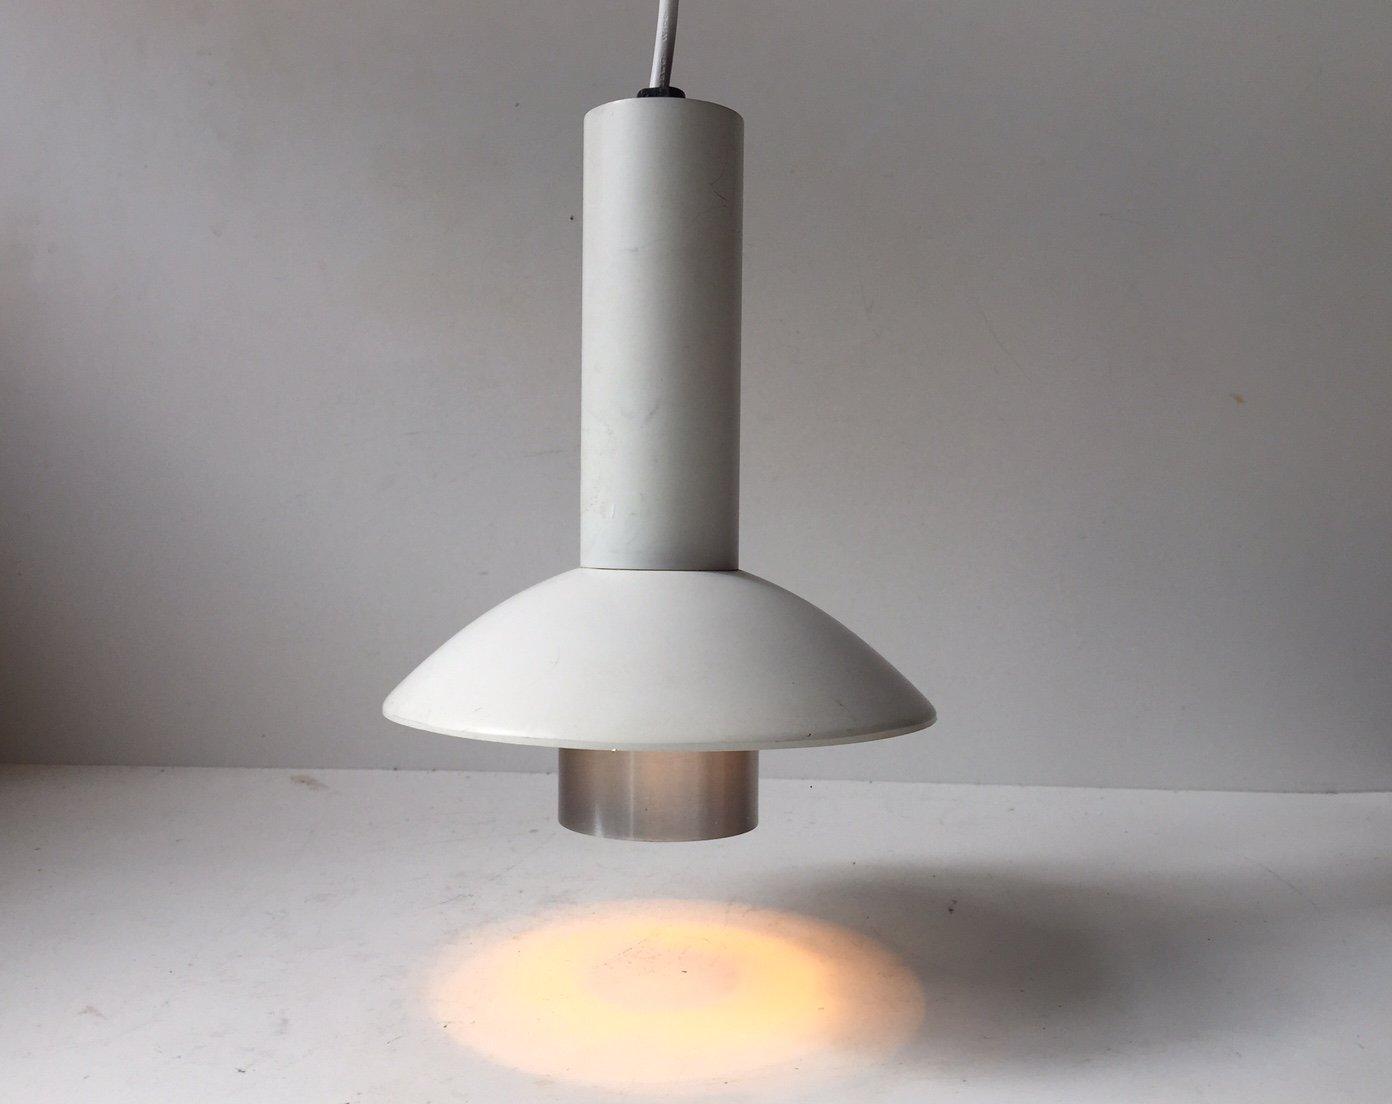 Vintage Danish White Minimalist Pendant Lamp by Louis